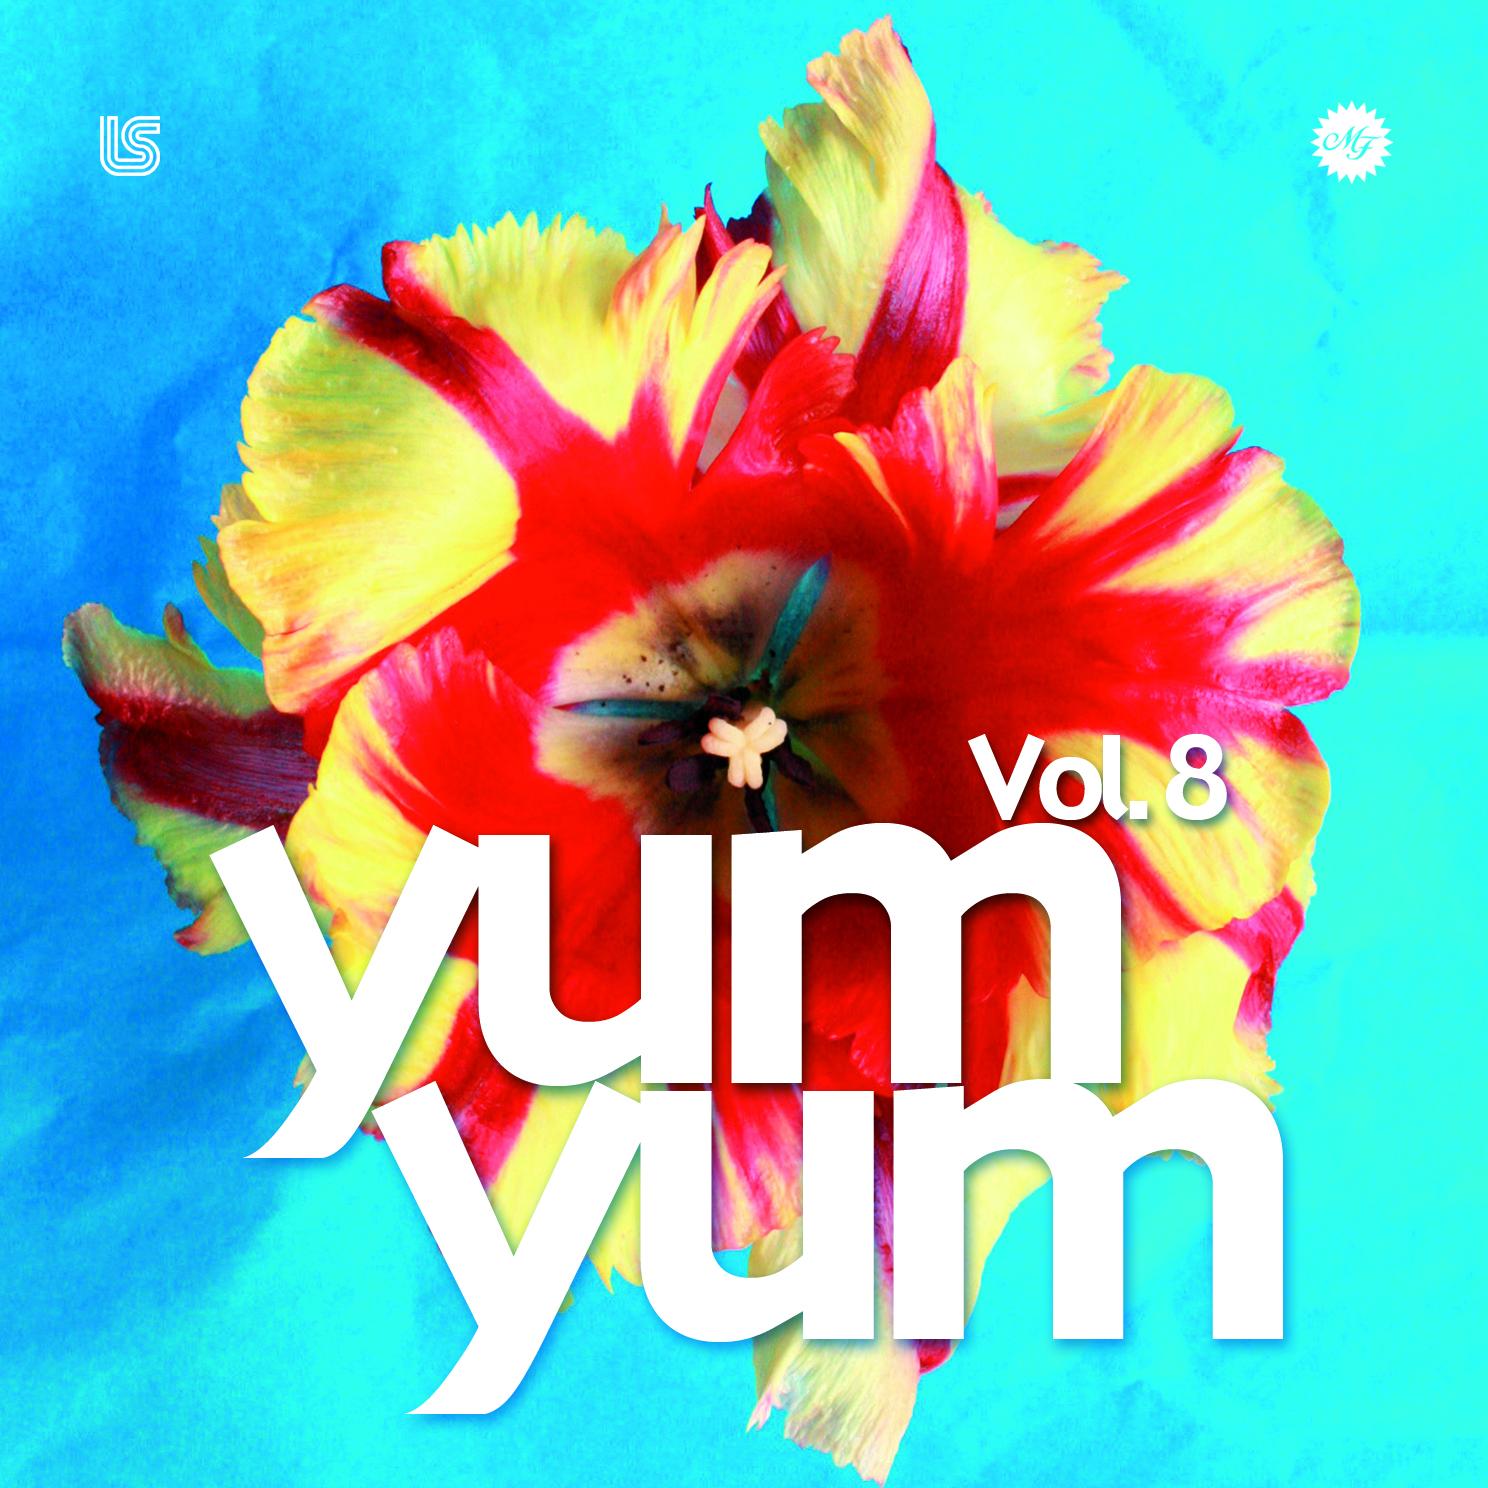 YY-Vol.8